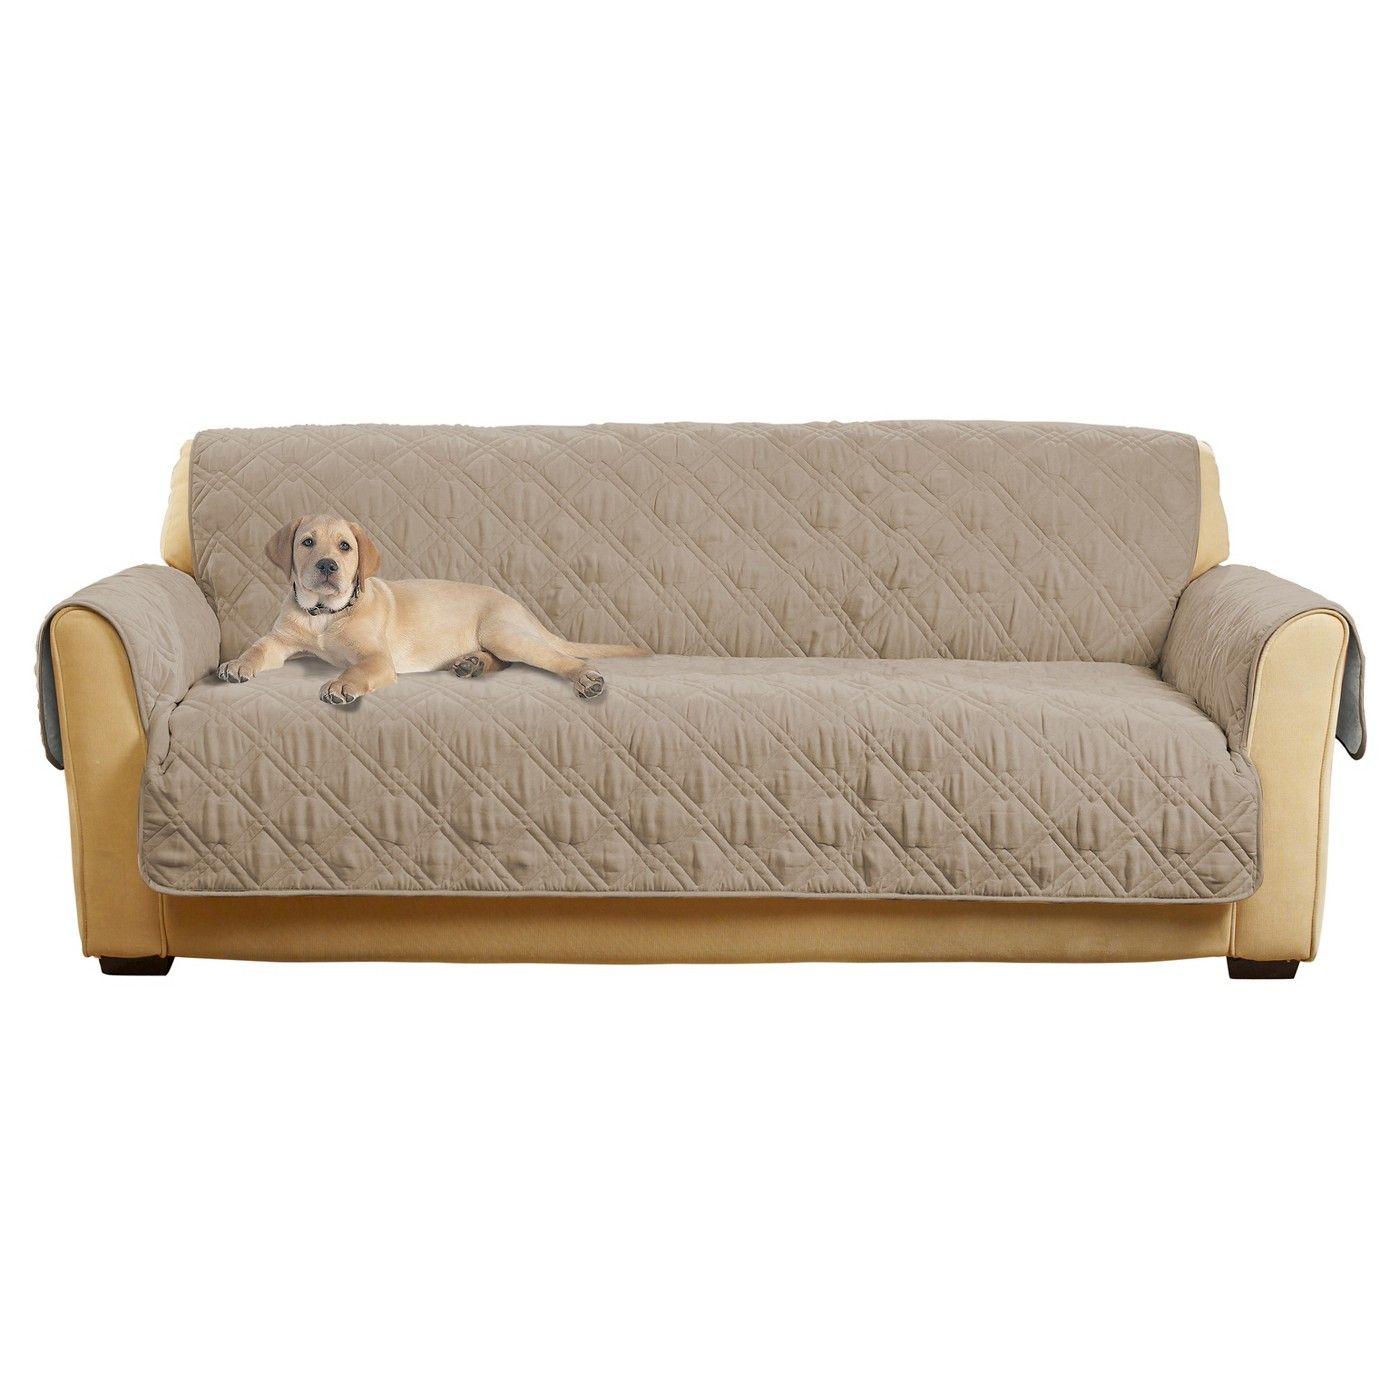 Non Slip Waterproof Sofa Furniture Cover Sure Fit Image 1 Of 3 Sofa Furniture Furniture Covers Couch Covers